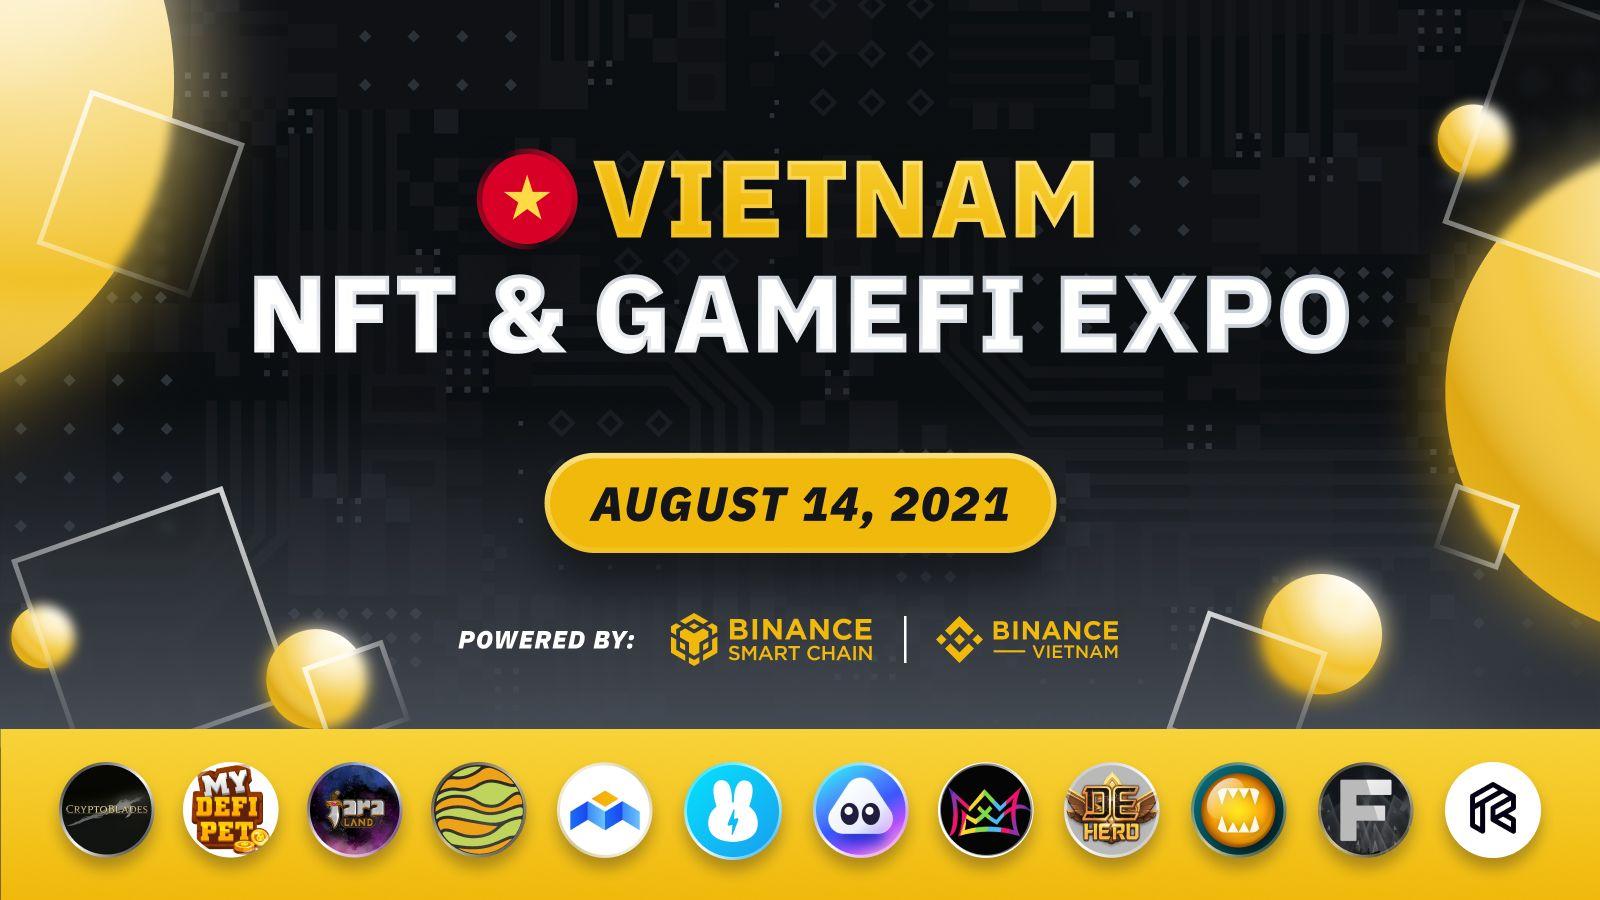 Vietnam NFT & GameFi Expo